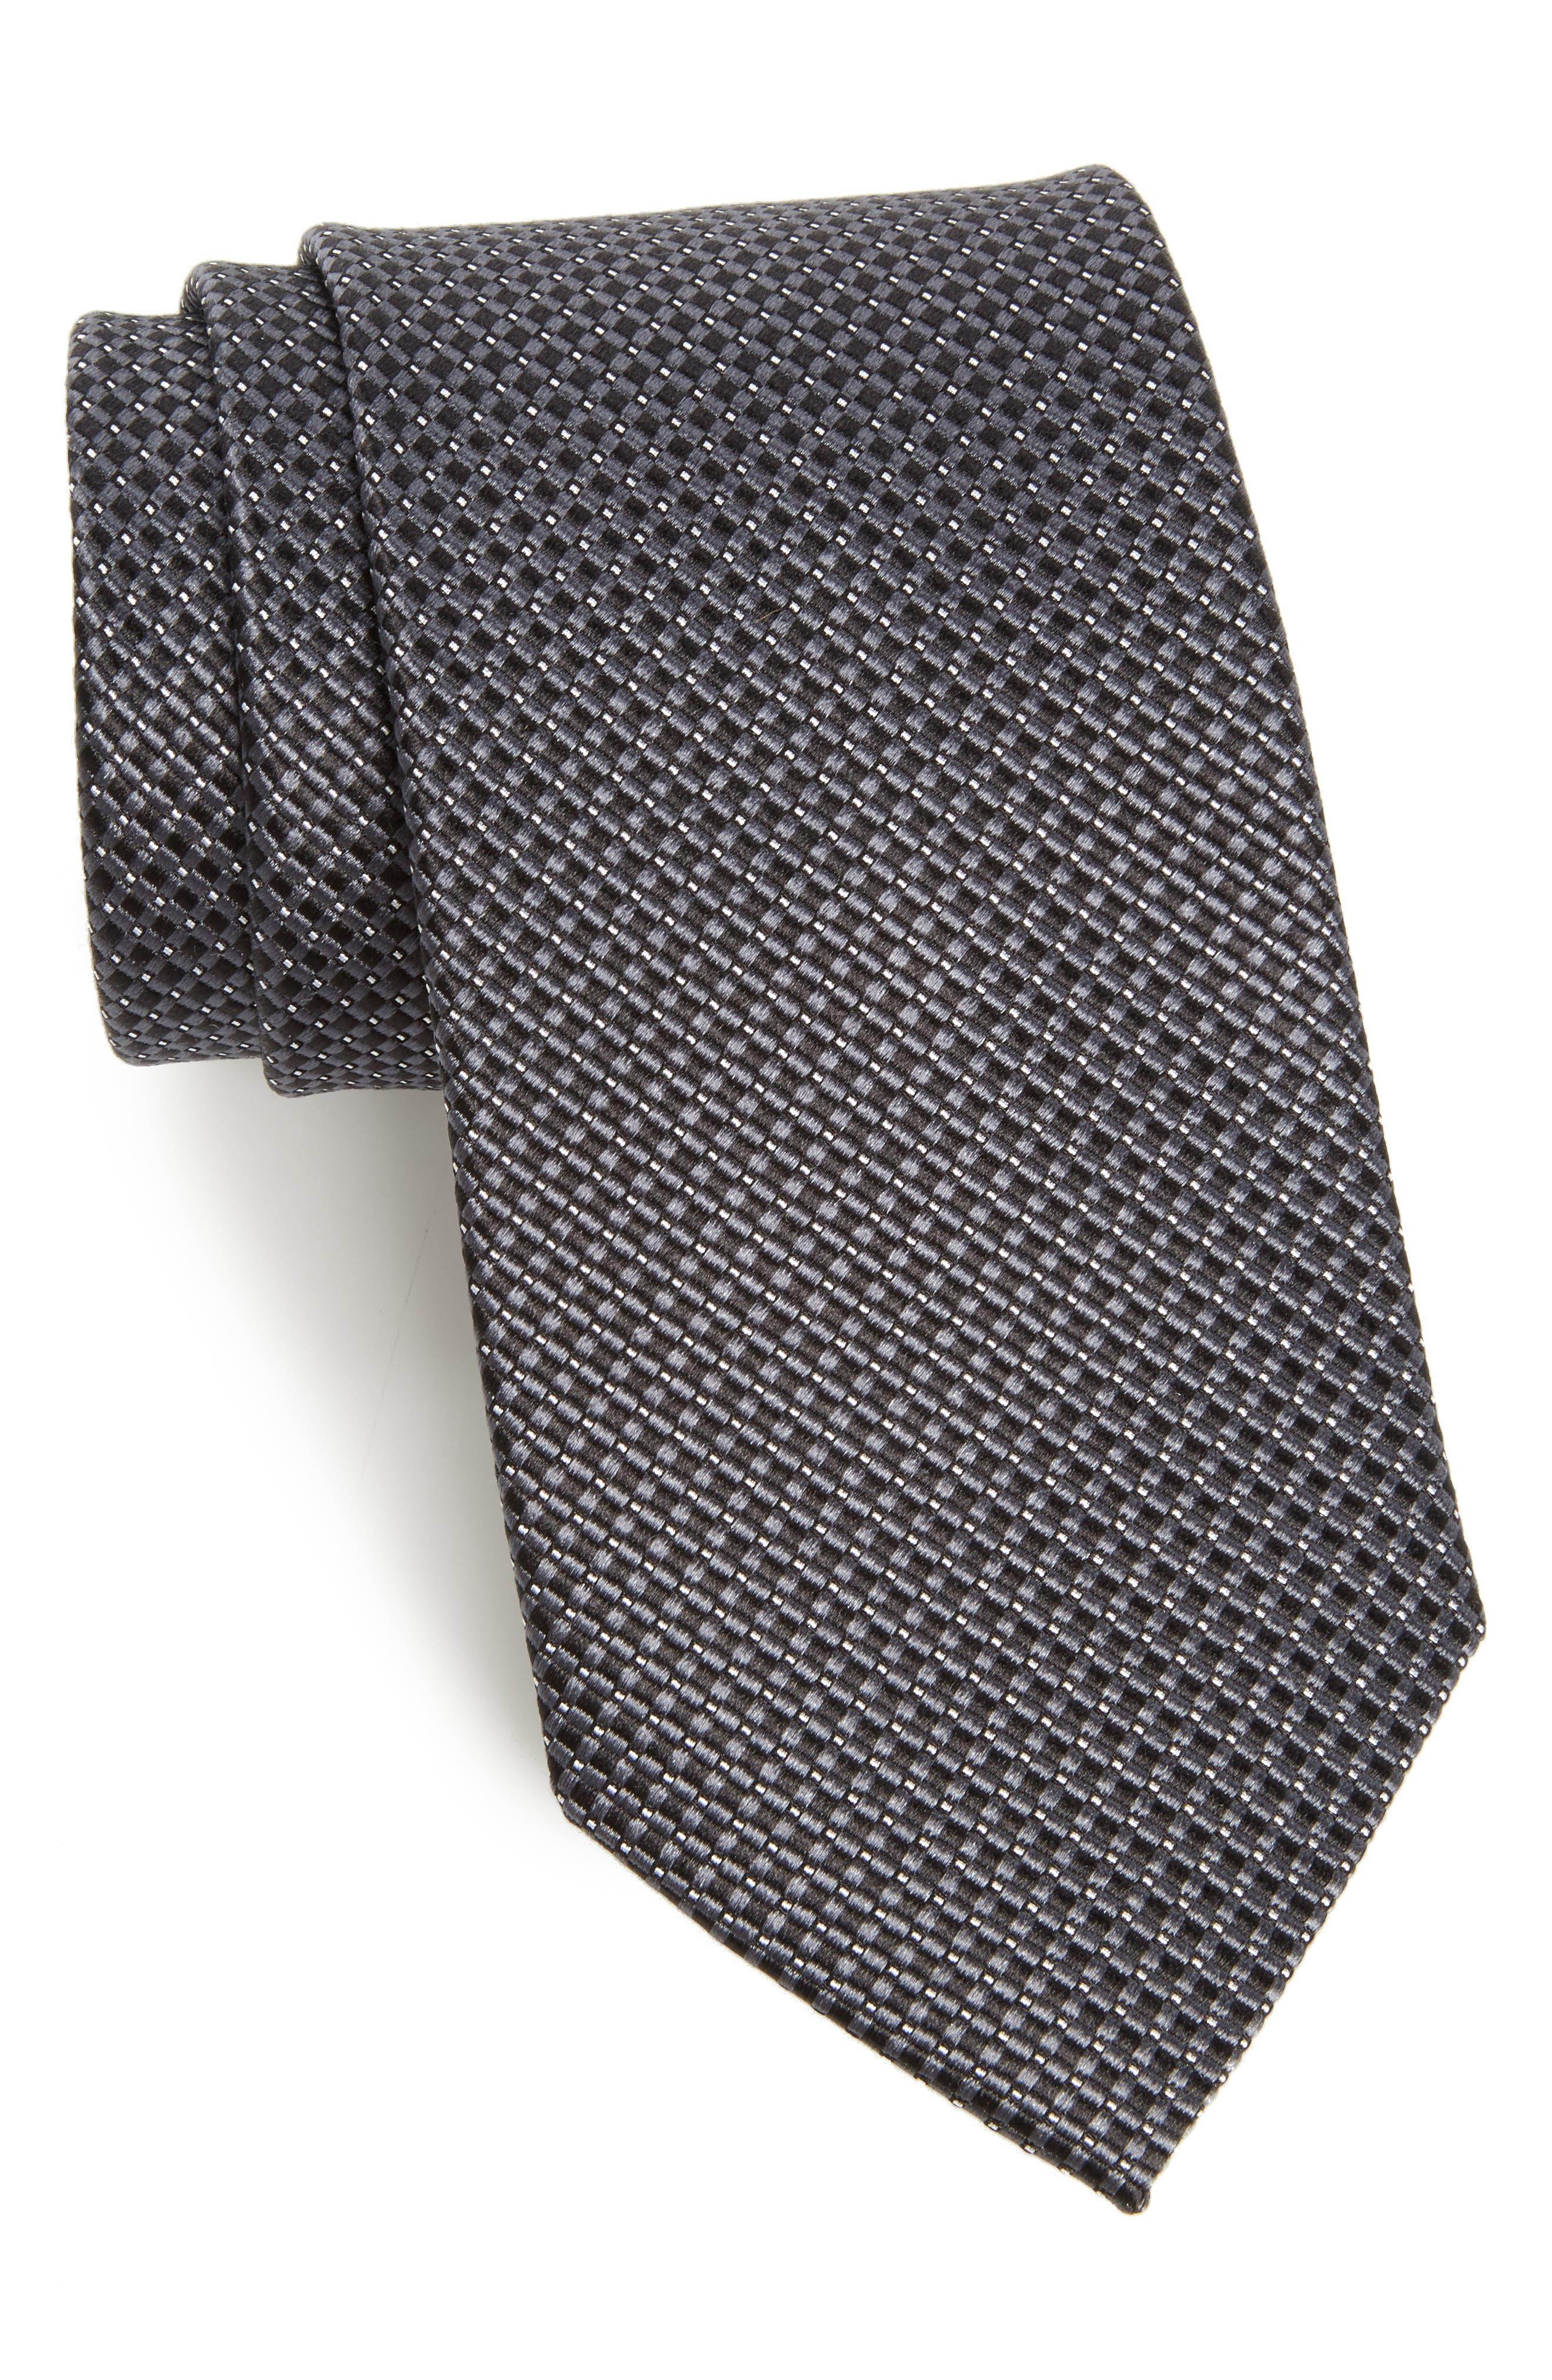 Microgrid Silk Tie,                             Main thumbnail 1, color,                             BLACK